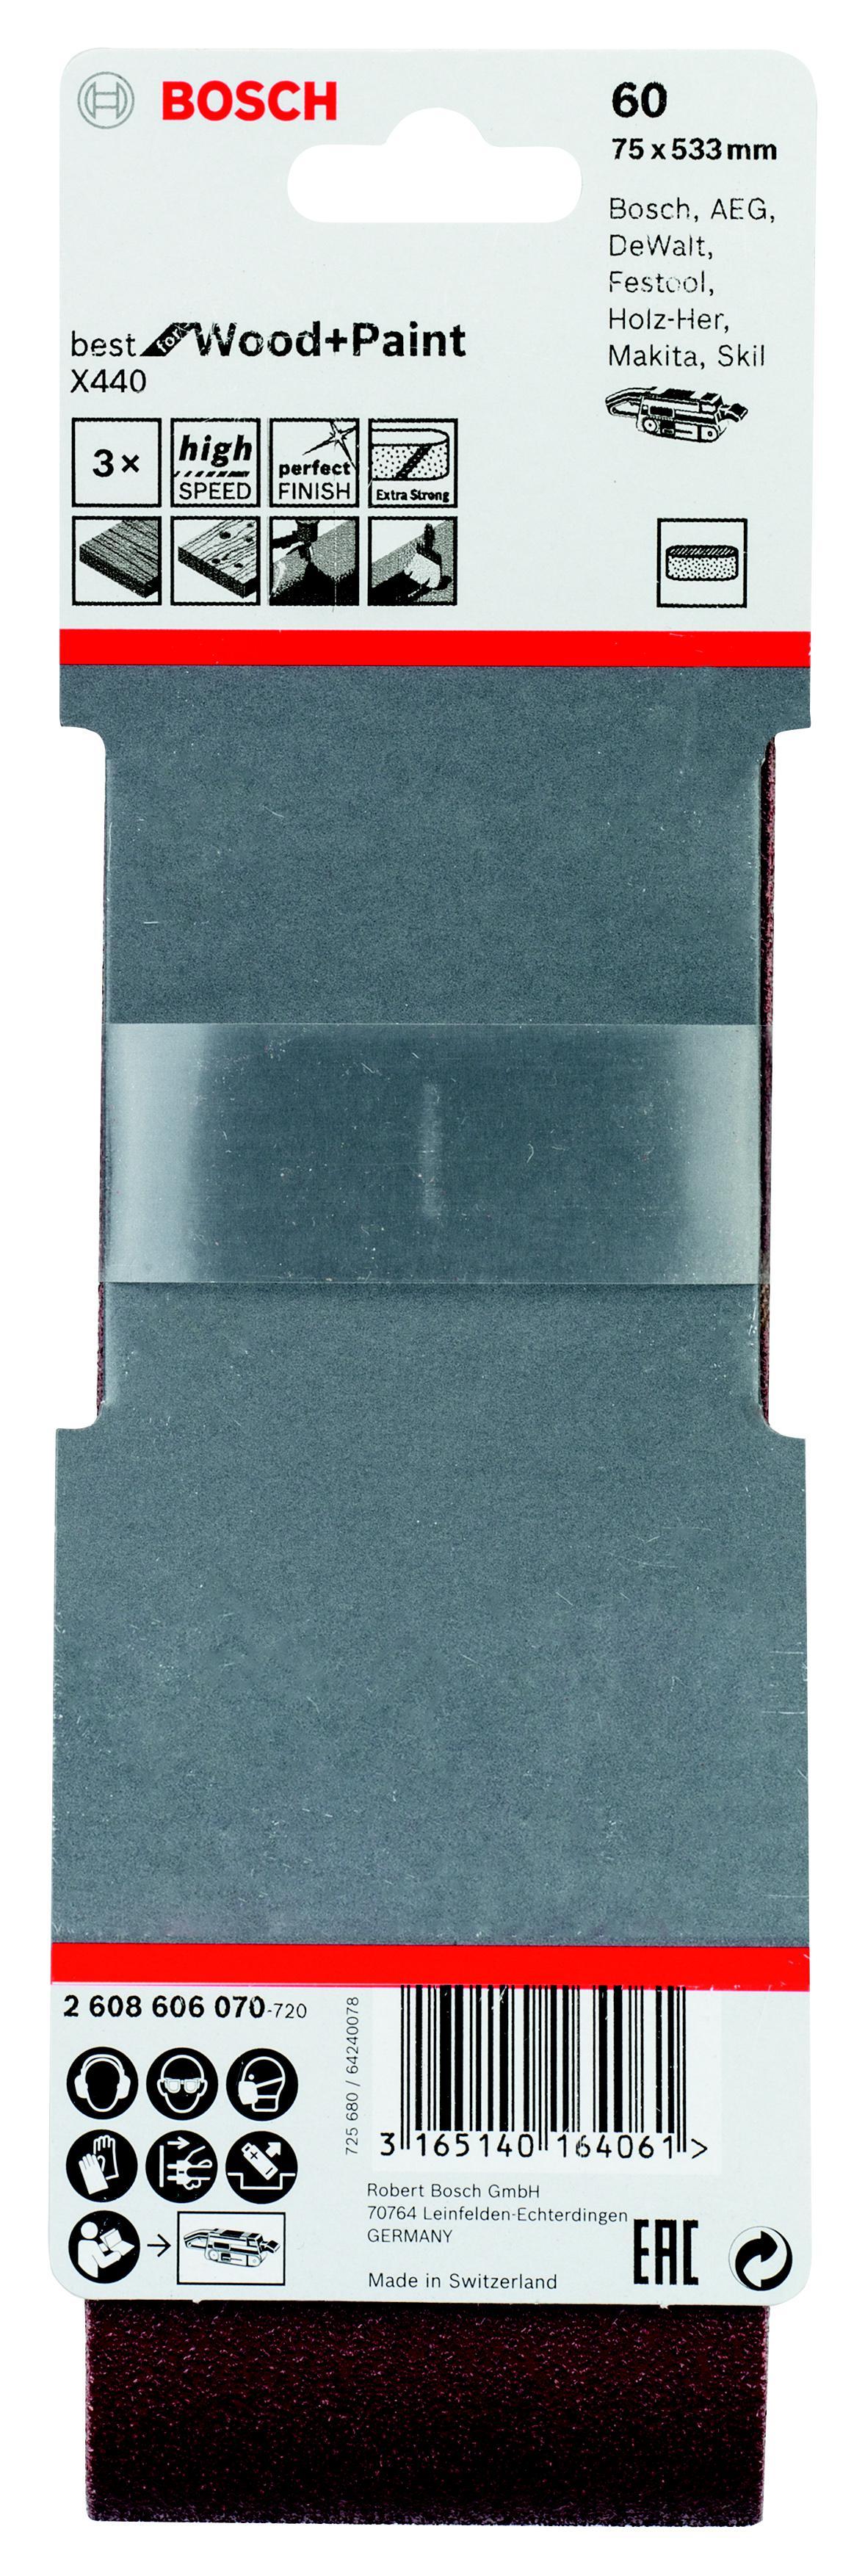 Лента шлифовальная бесконечная Bosch 2608606070 лента шлифовальная бесконечная hammer flex 75 х 533 р 60 3шт